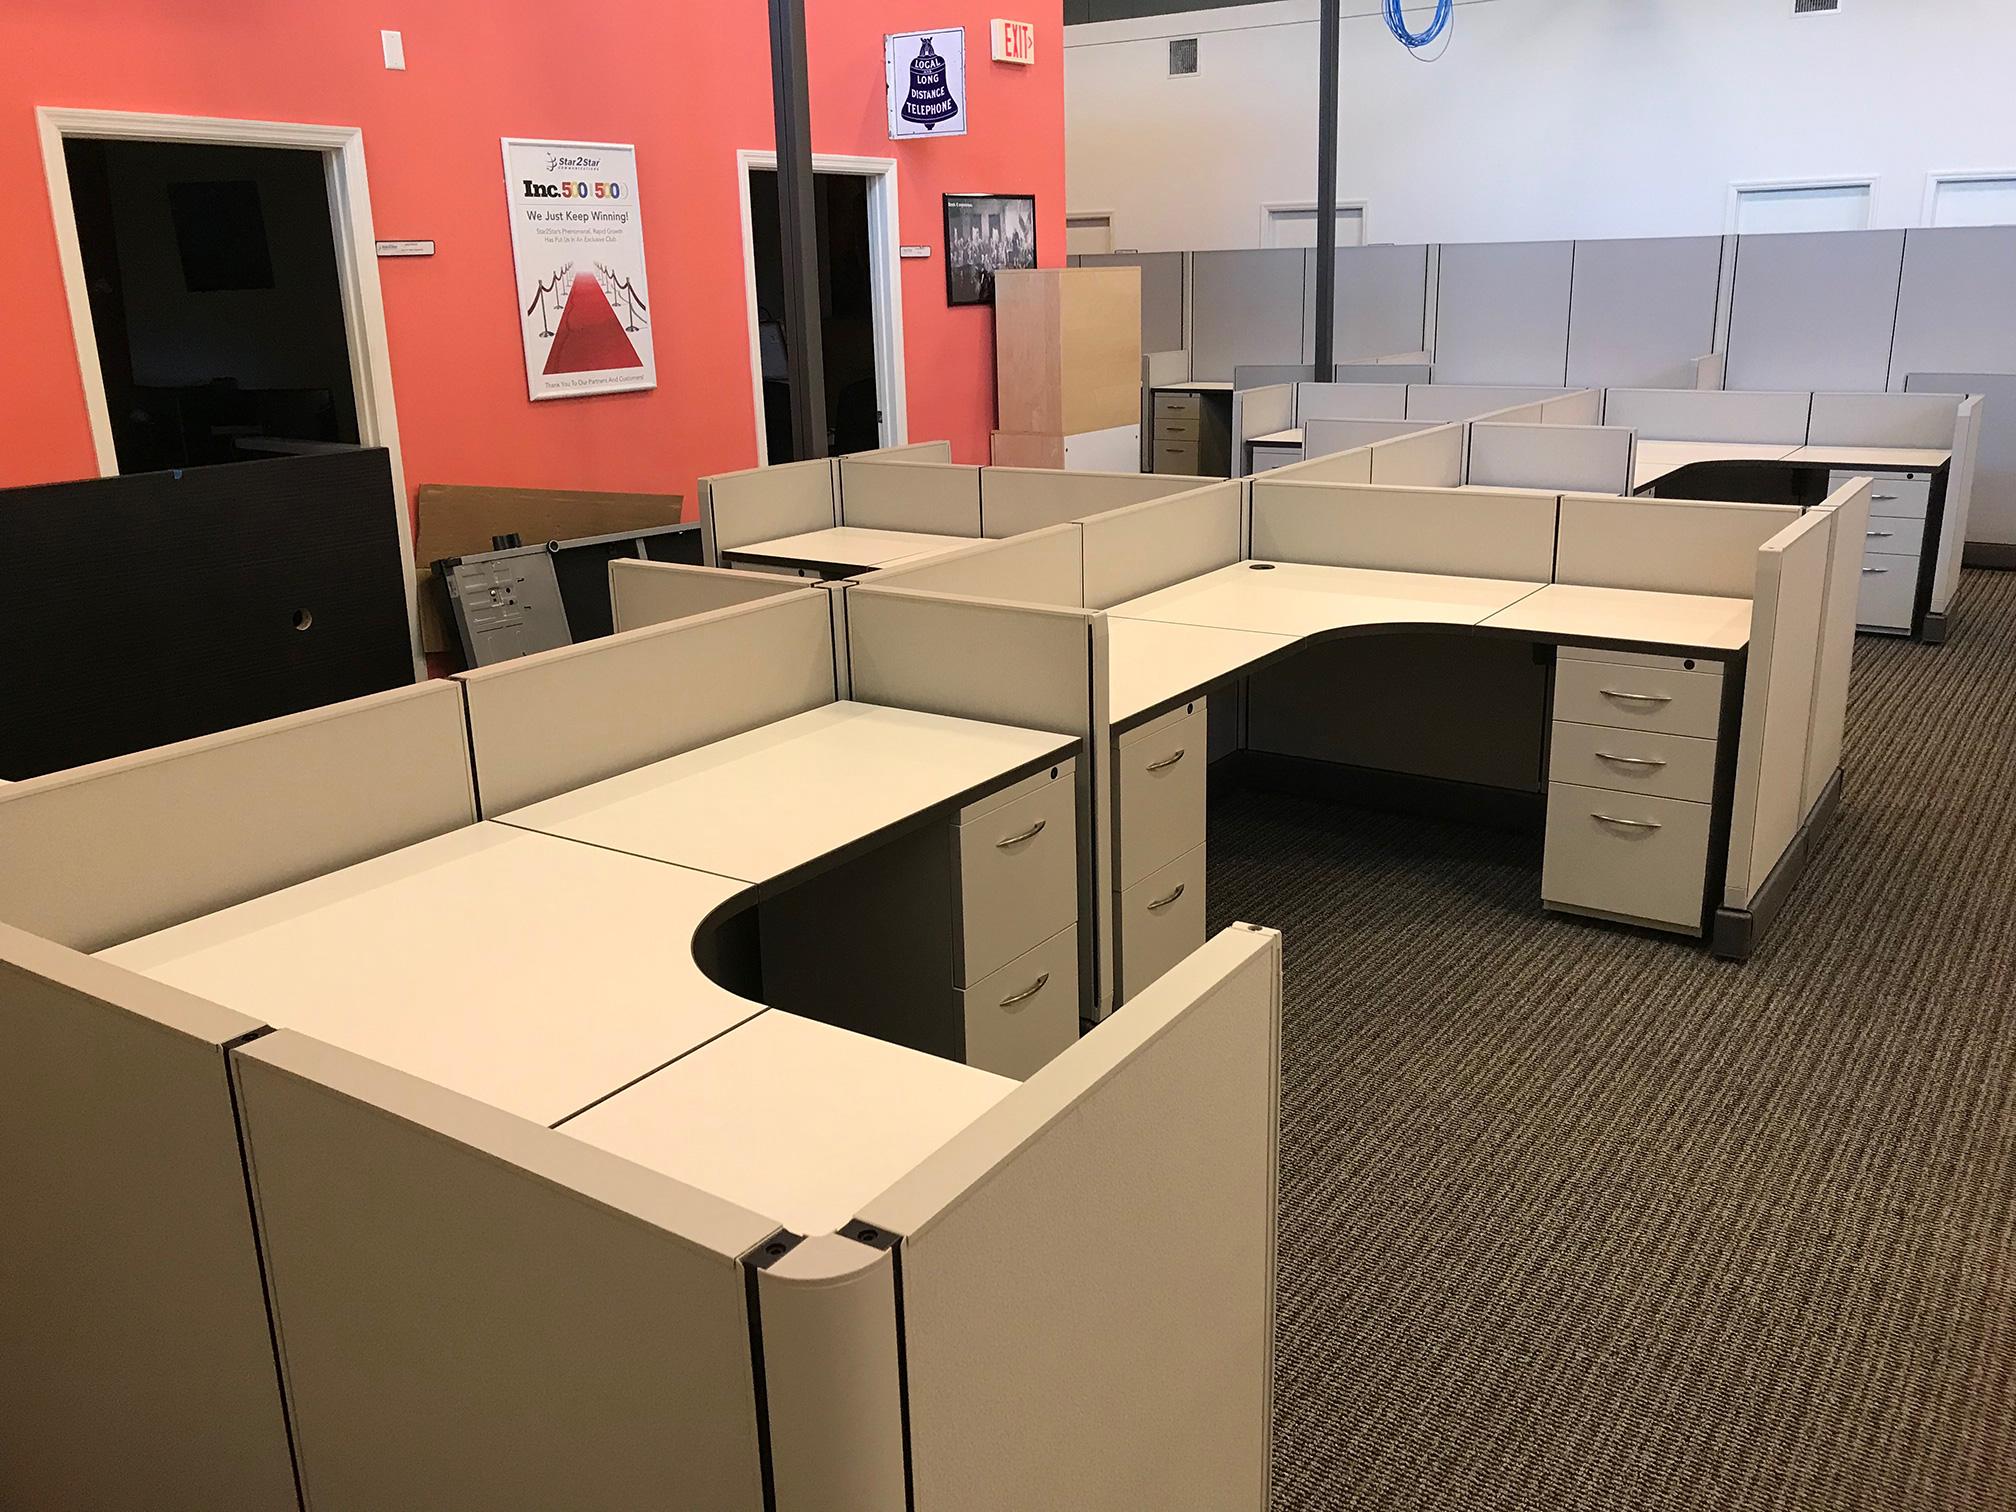 new-cubicle-workstations-sarasota-manasota-office-supplies-llc.jpg